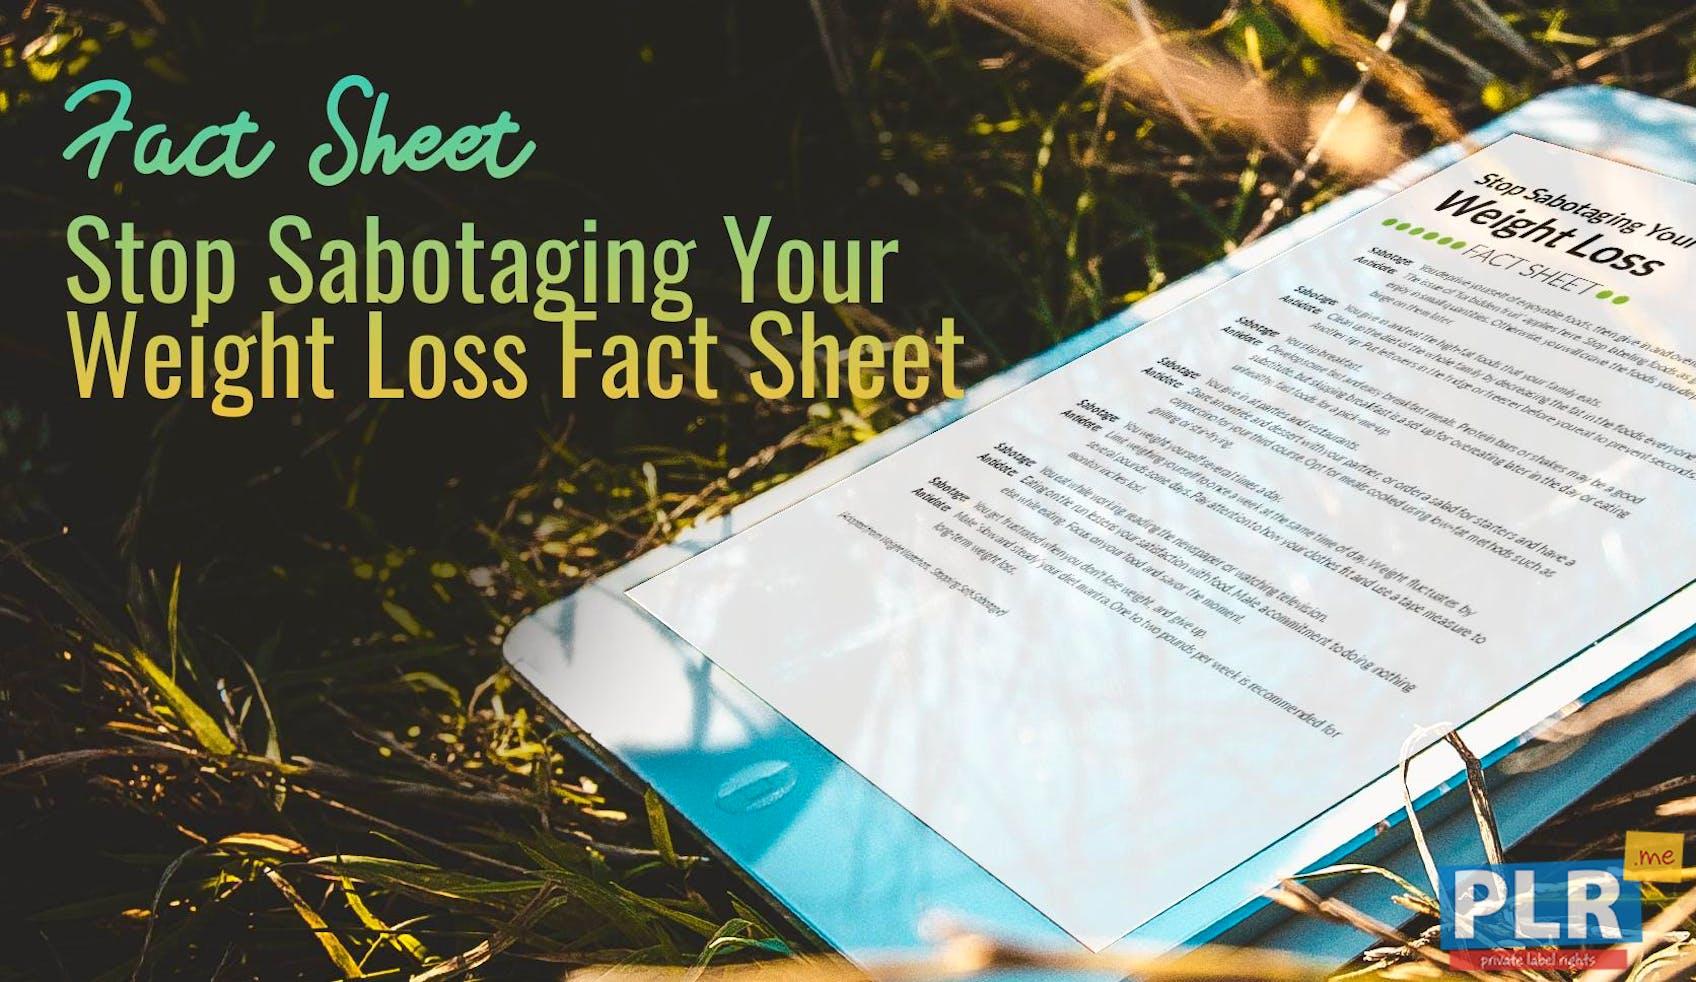 plr fact sheets stop sabotaging your weight loss fact sheet plr me